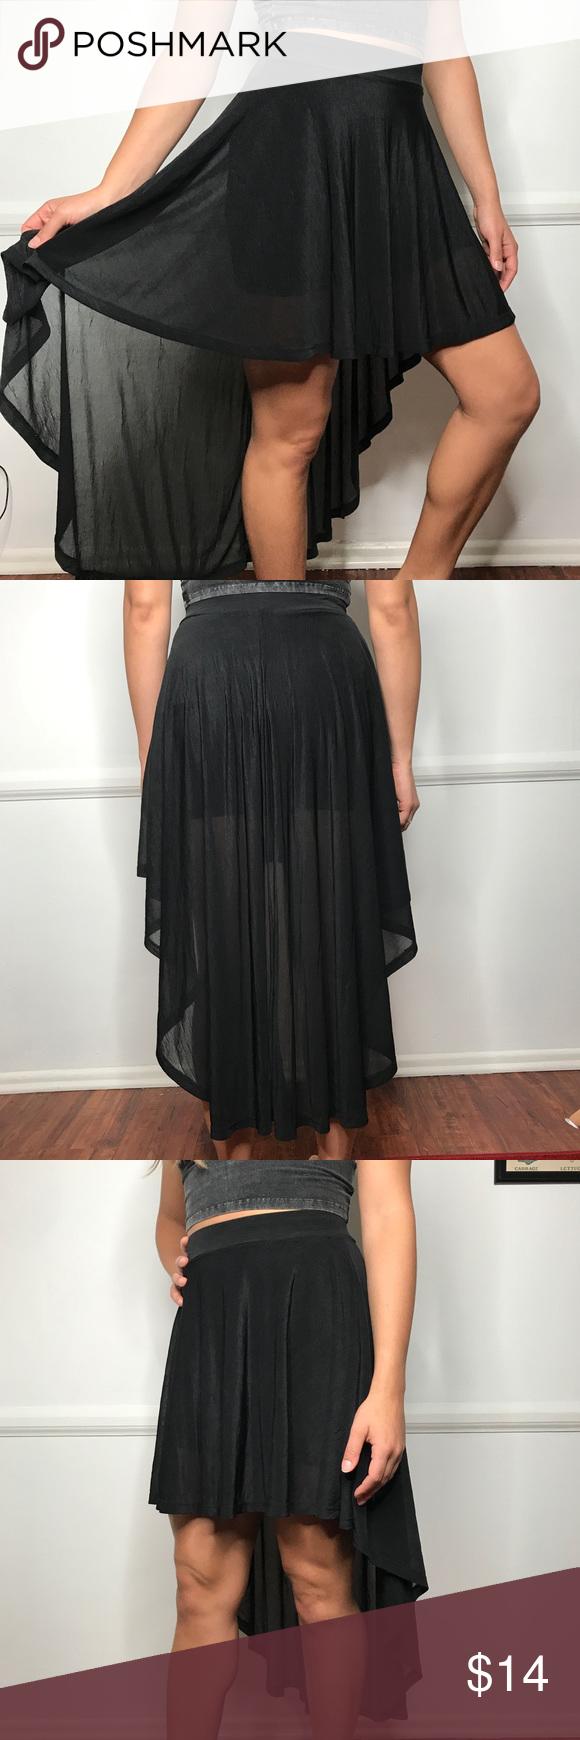 Short Skirt Black Las H M